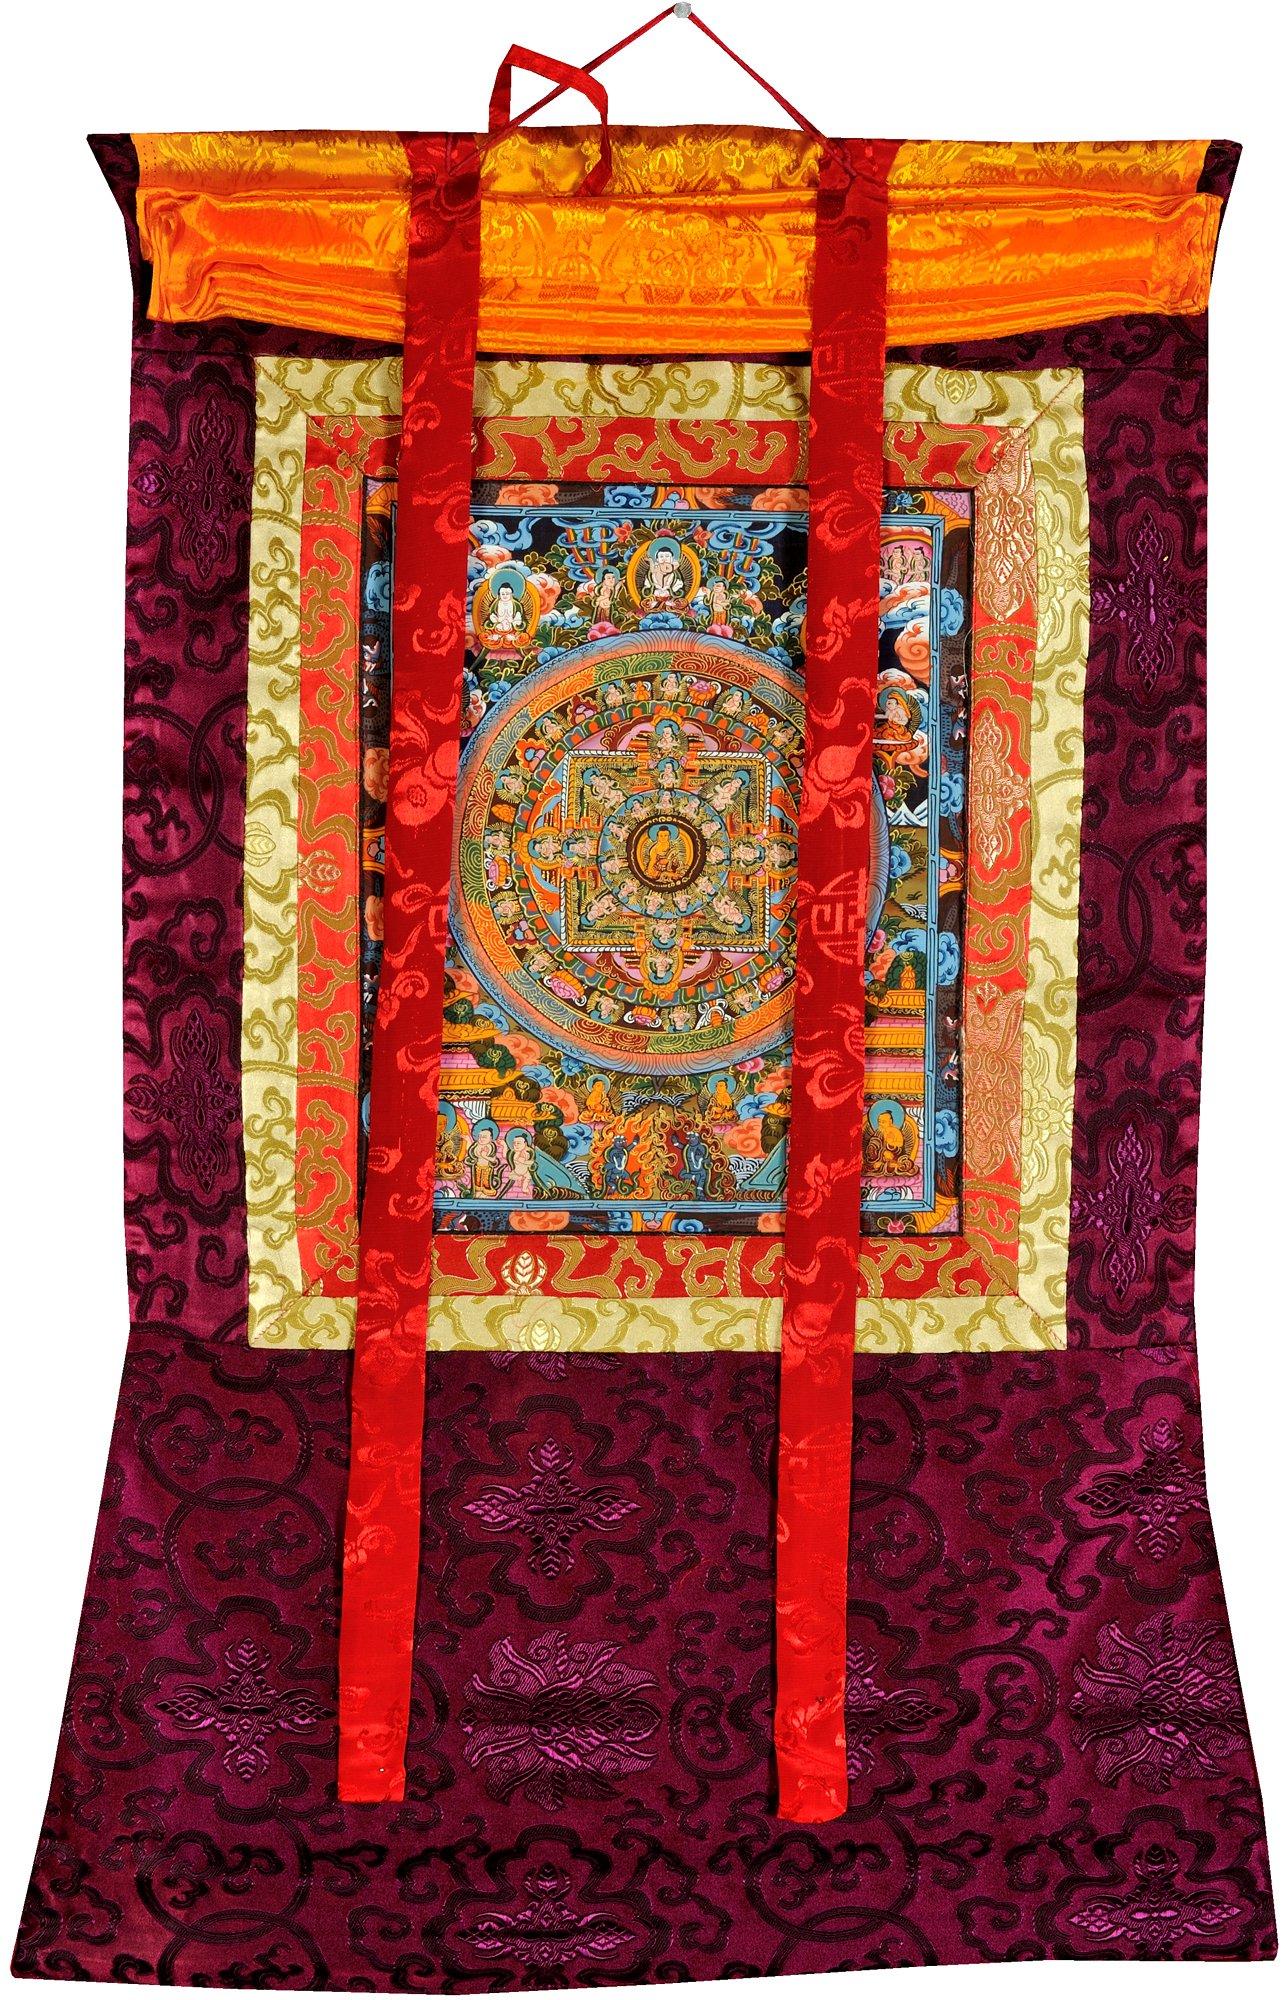 The Buddha Mandala -Tibetan Buddhist - Tibetan Thangka Painting by Exotic India (Image #2)